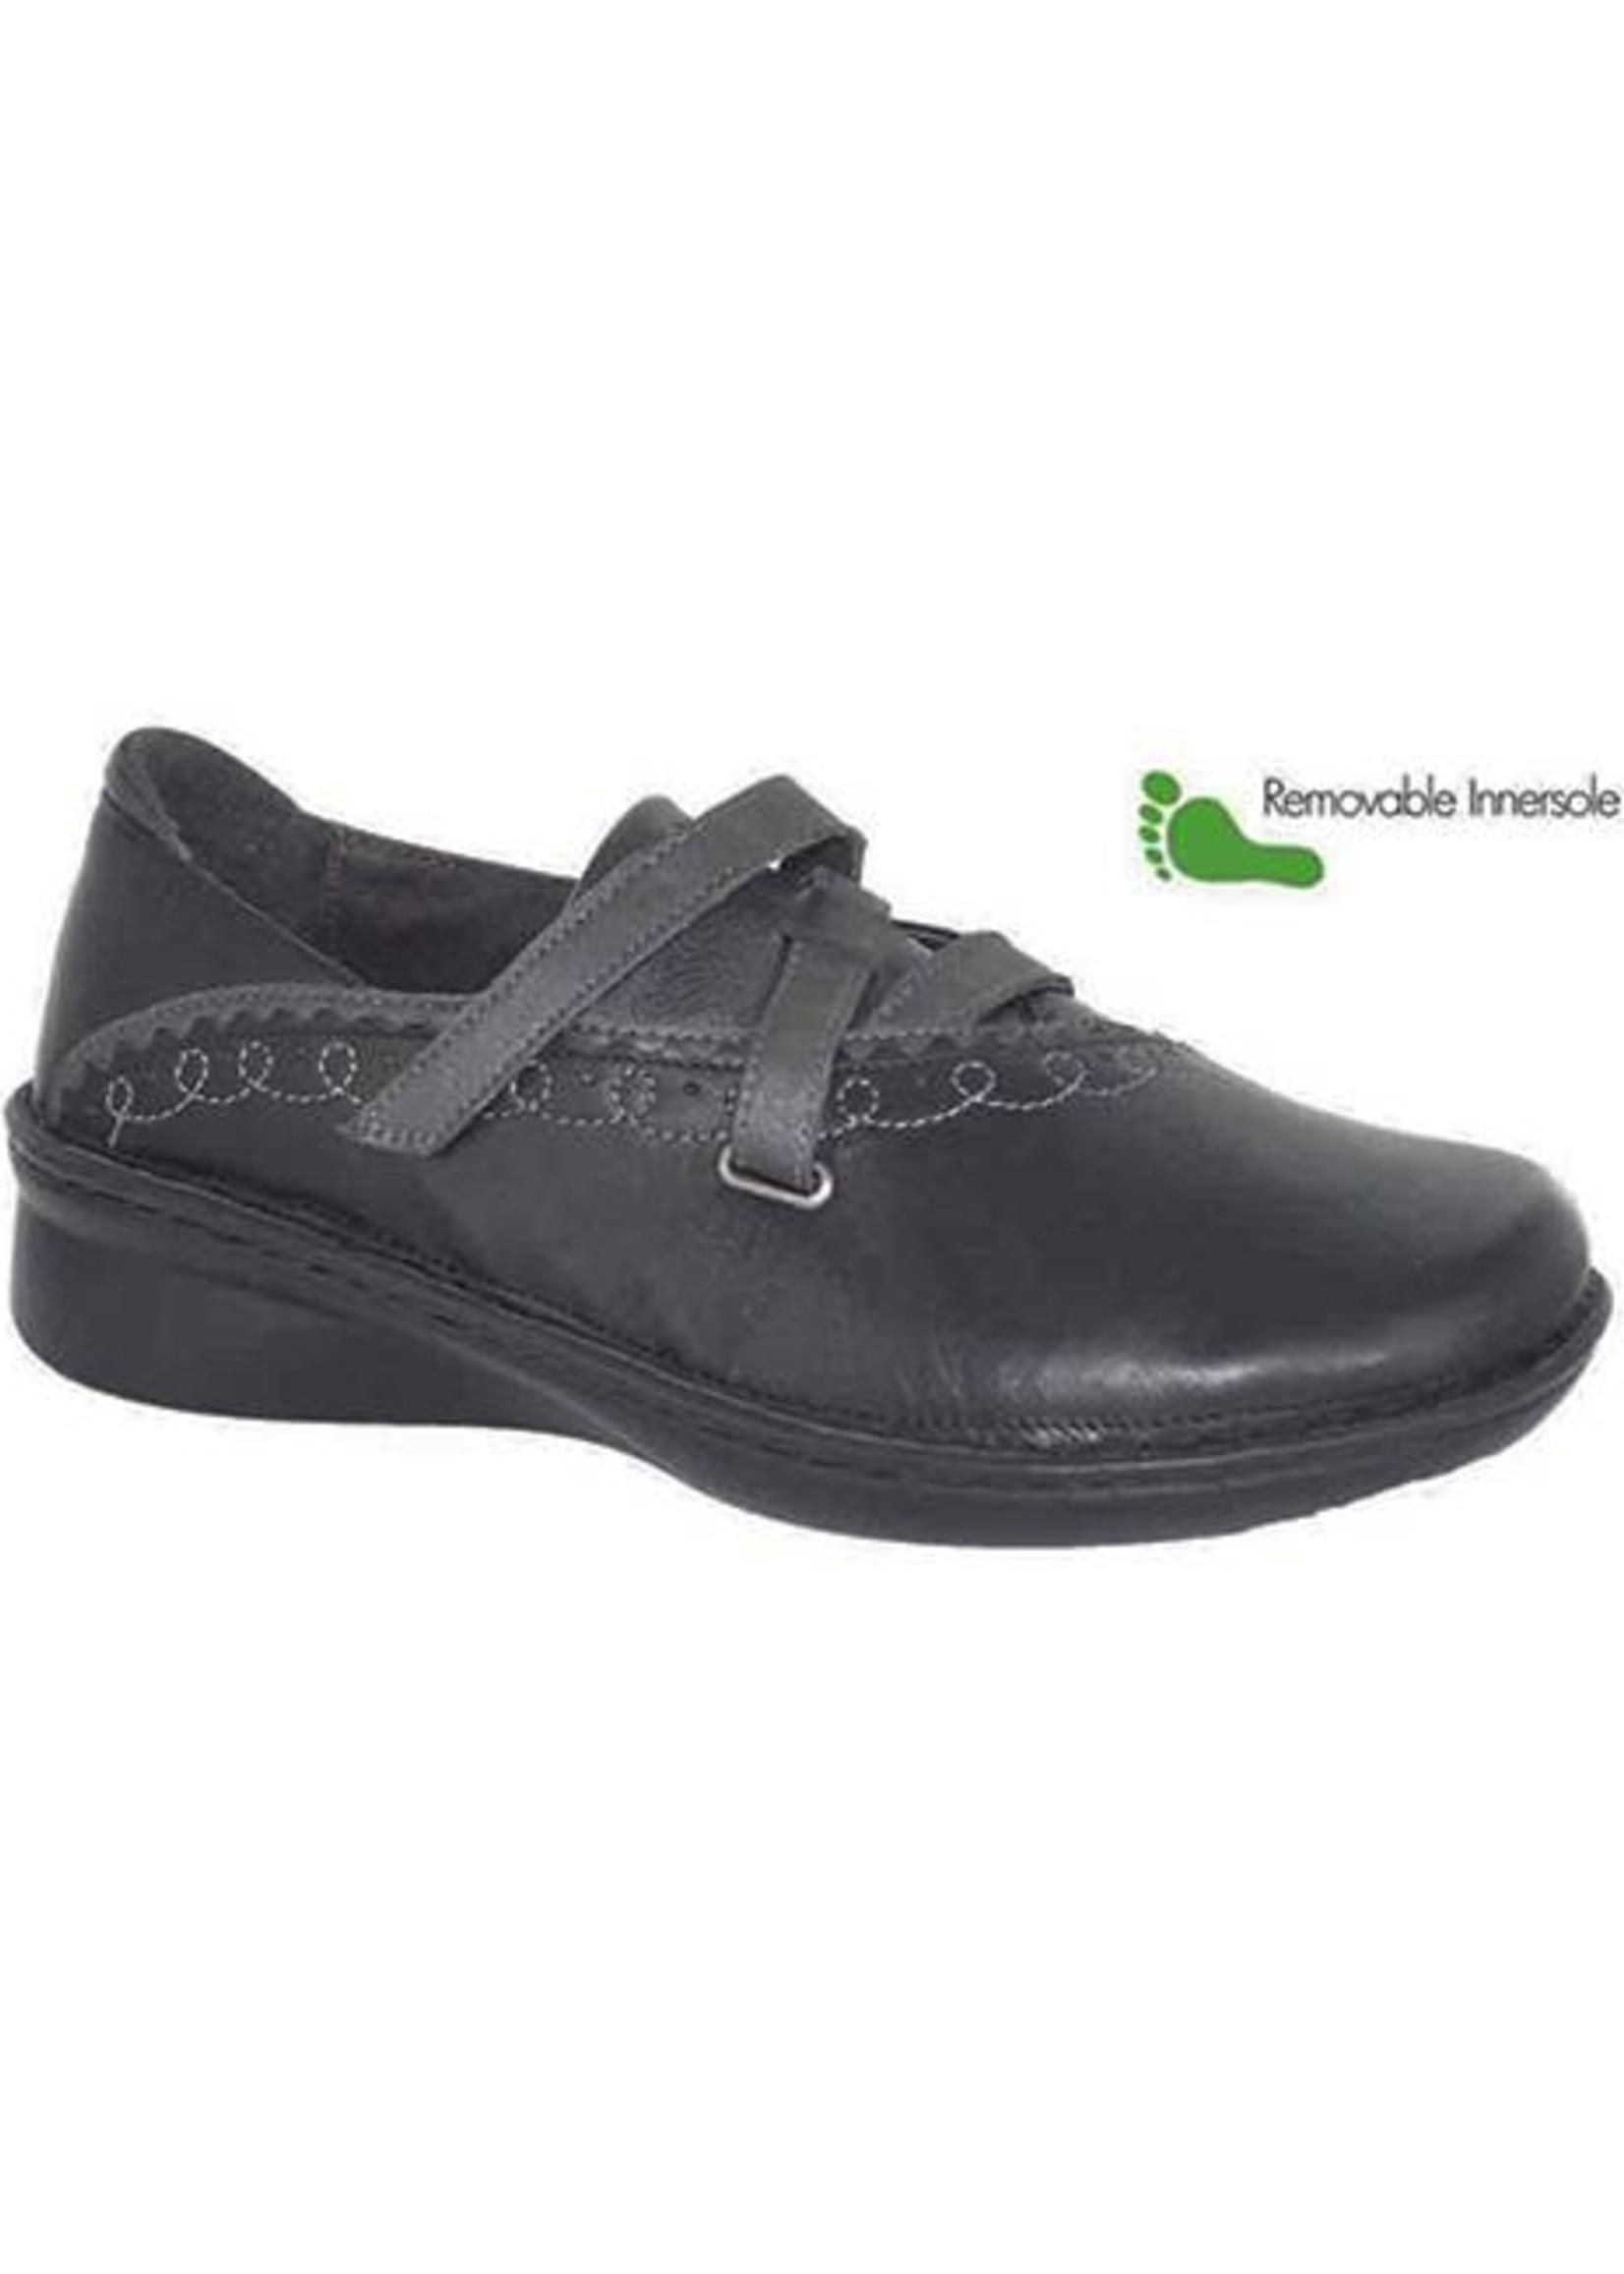 Naot Footwear Alto in Metallic Black Grey